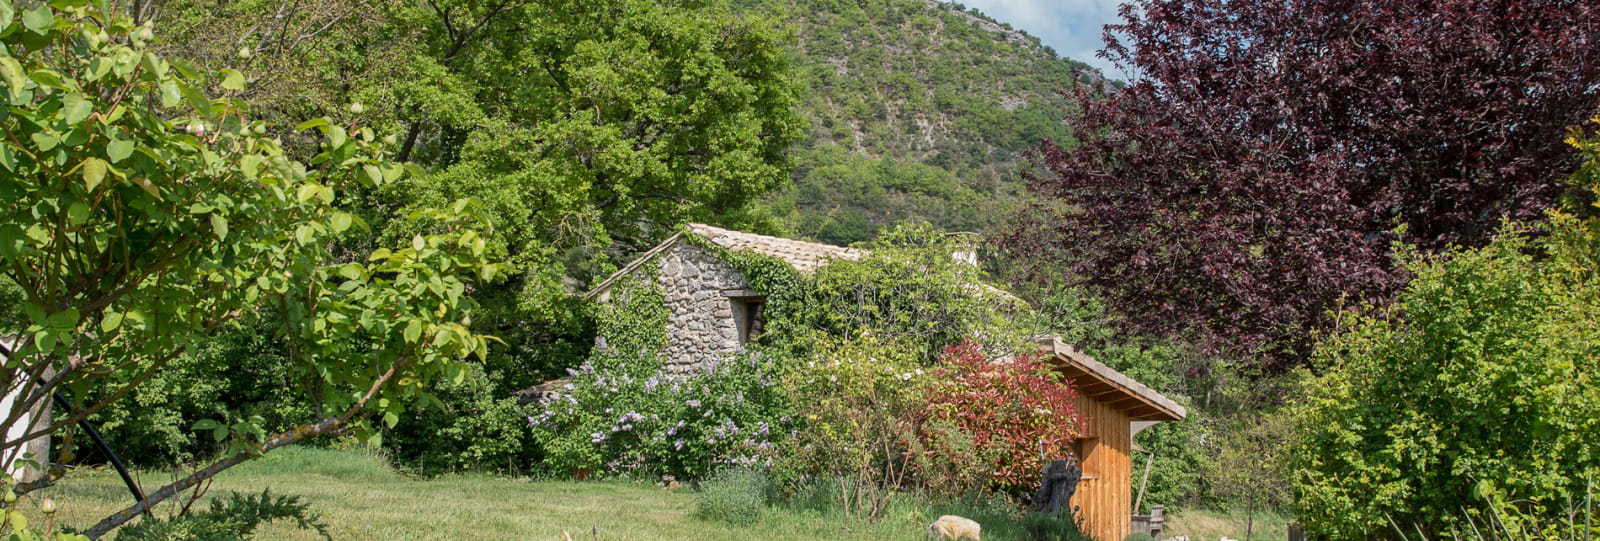 Gehucht van gîtes la Roseraie Drôme